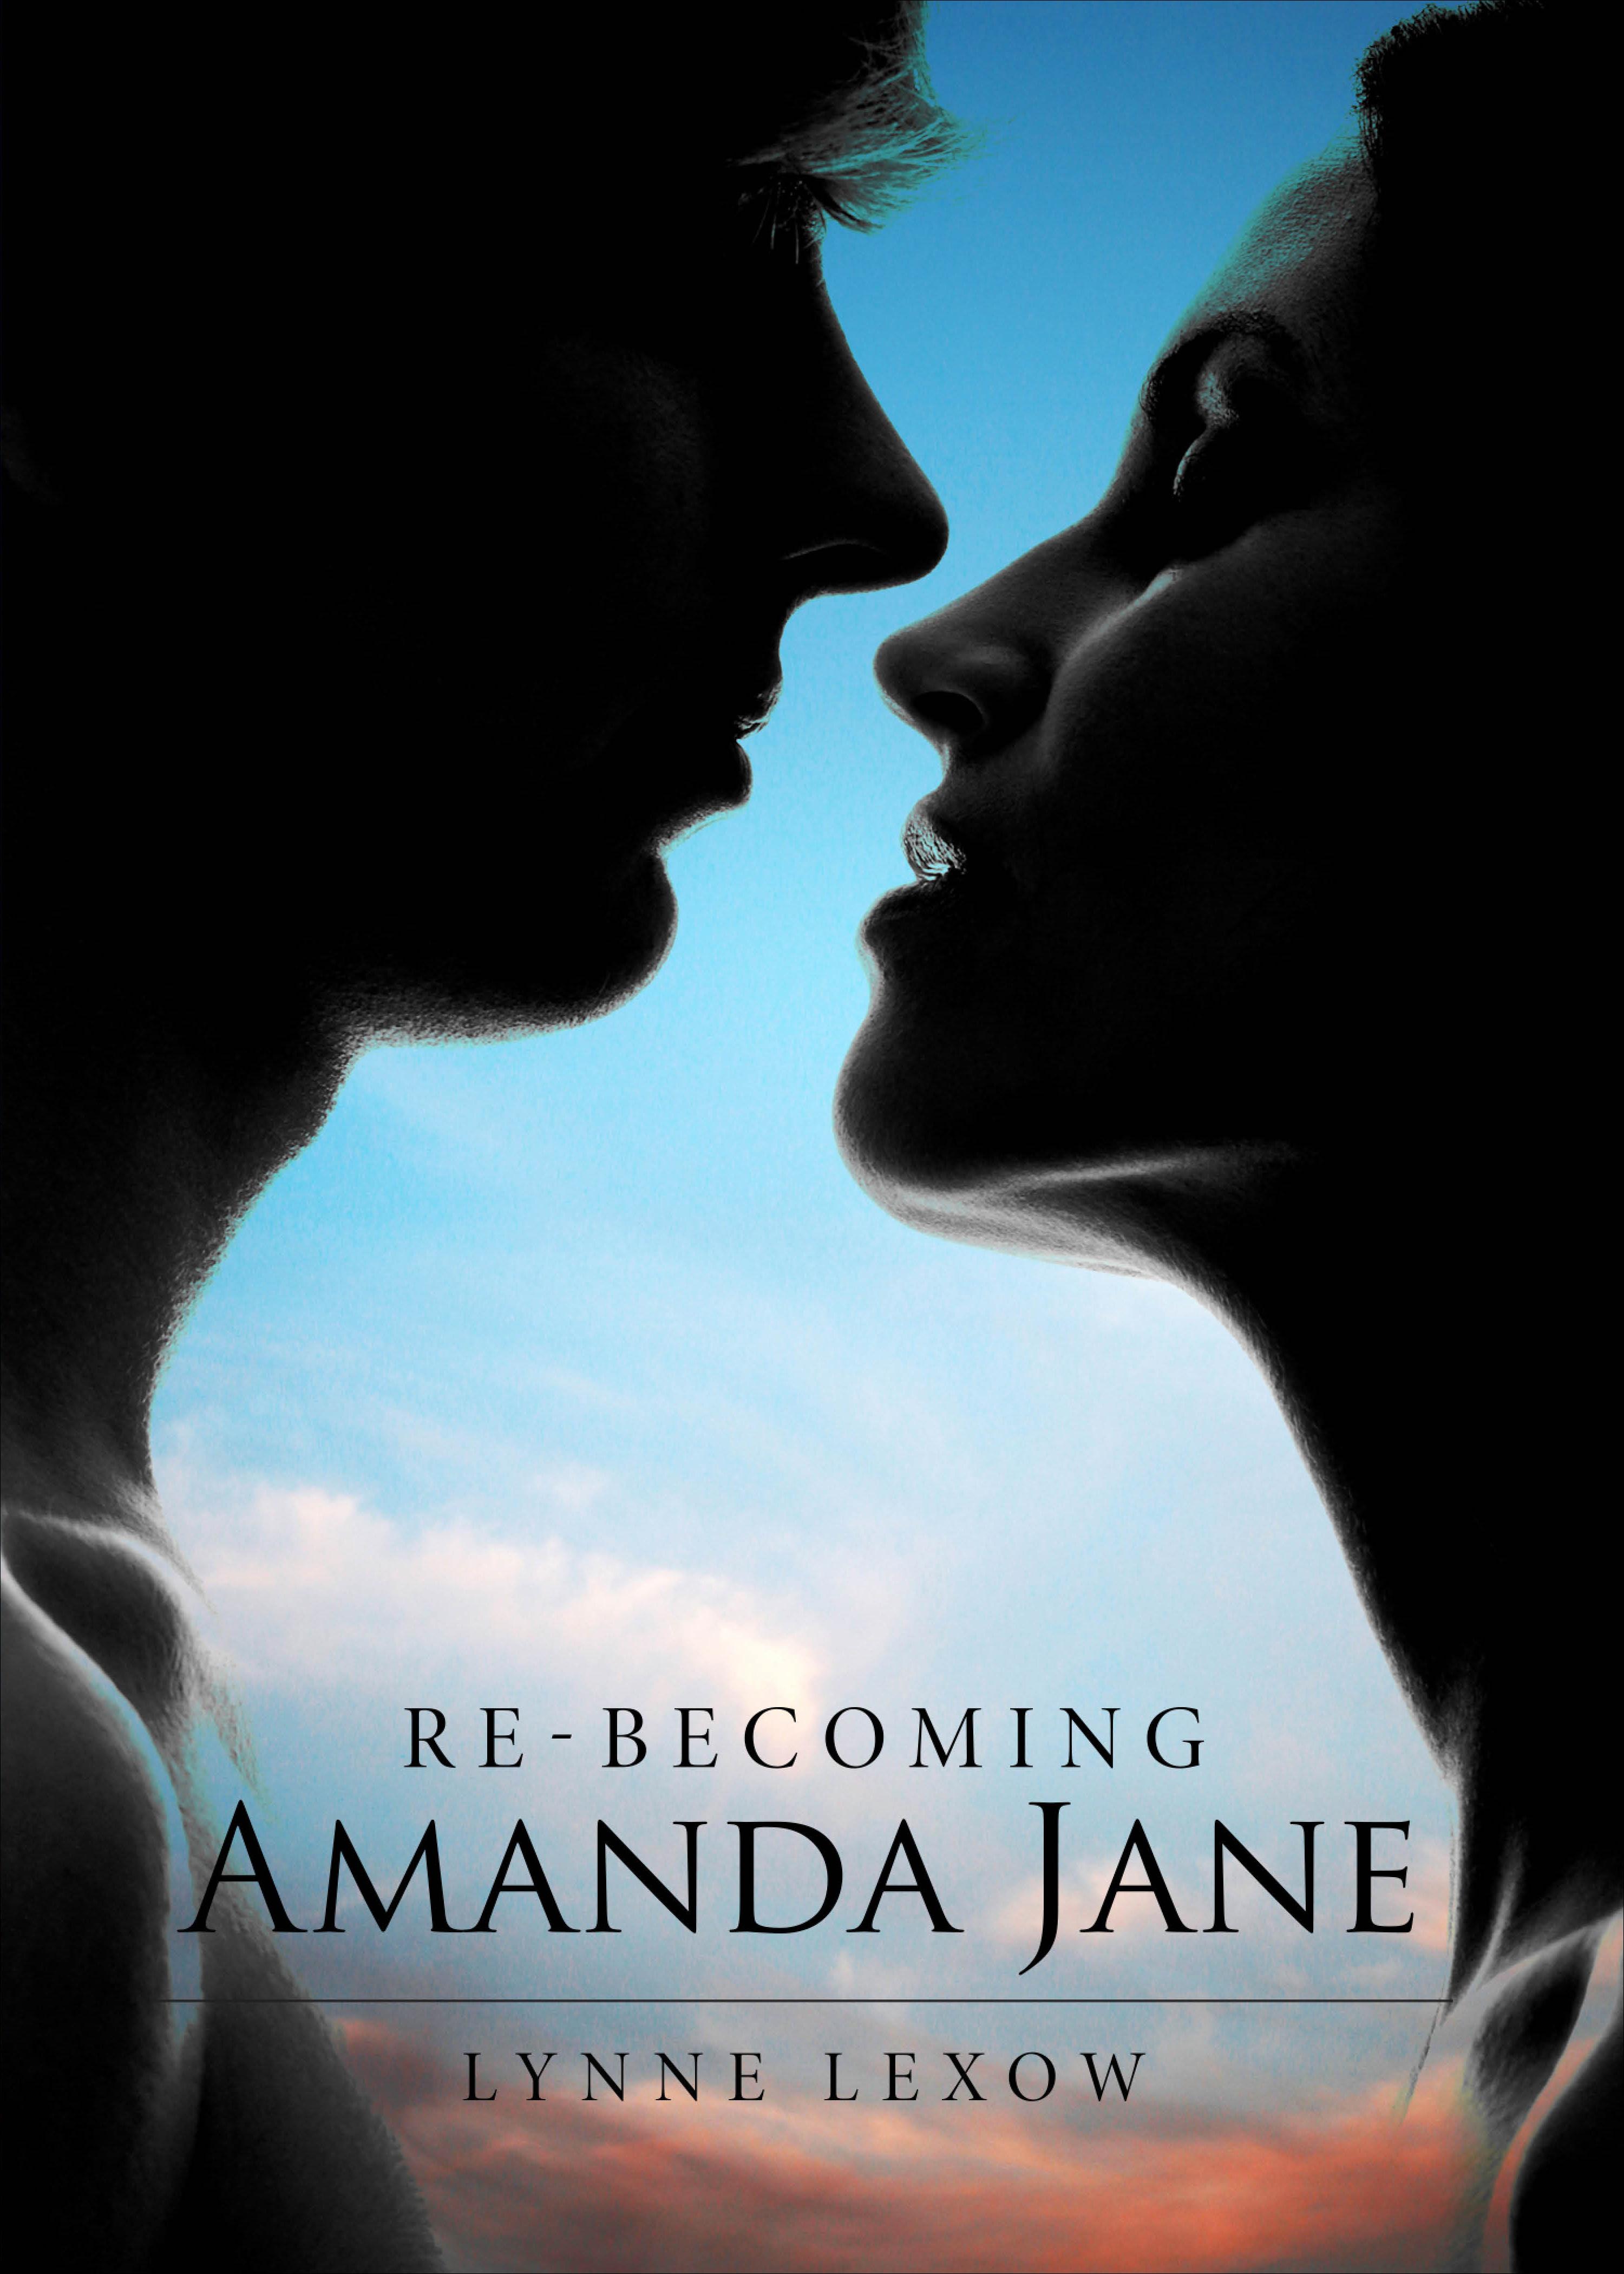 Re-Becoming Amanda Jane  by  Lynne Lexow